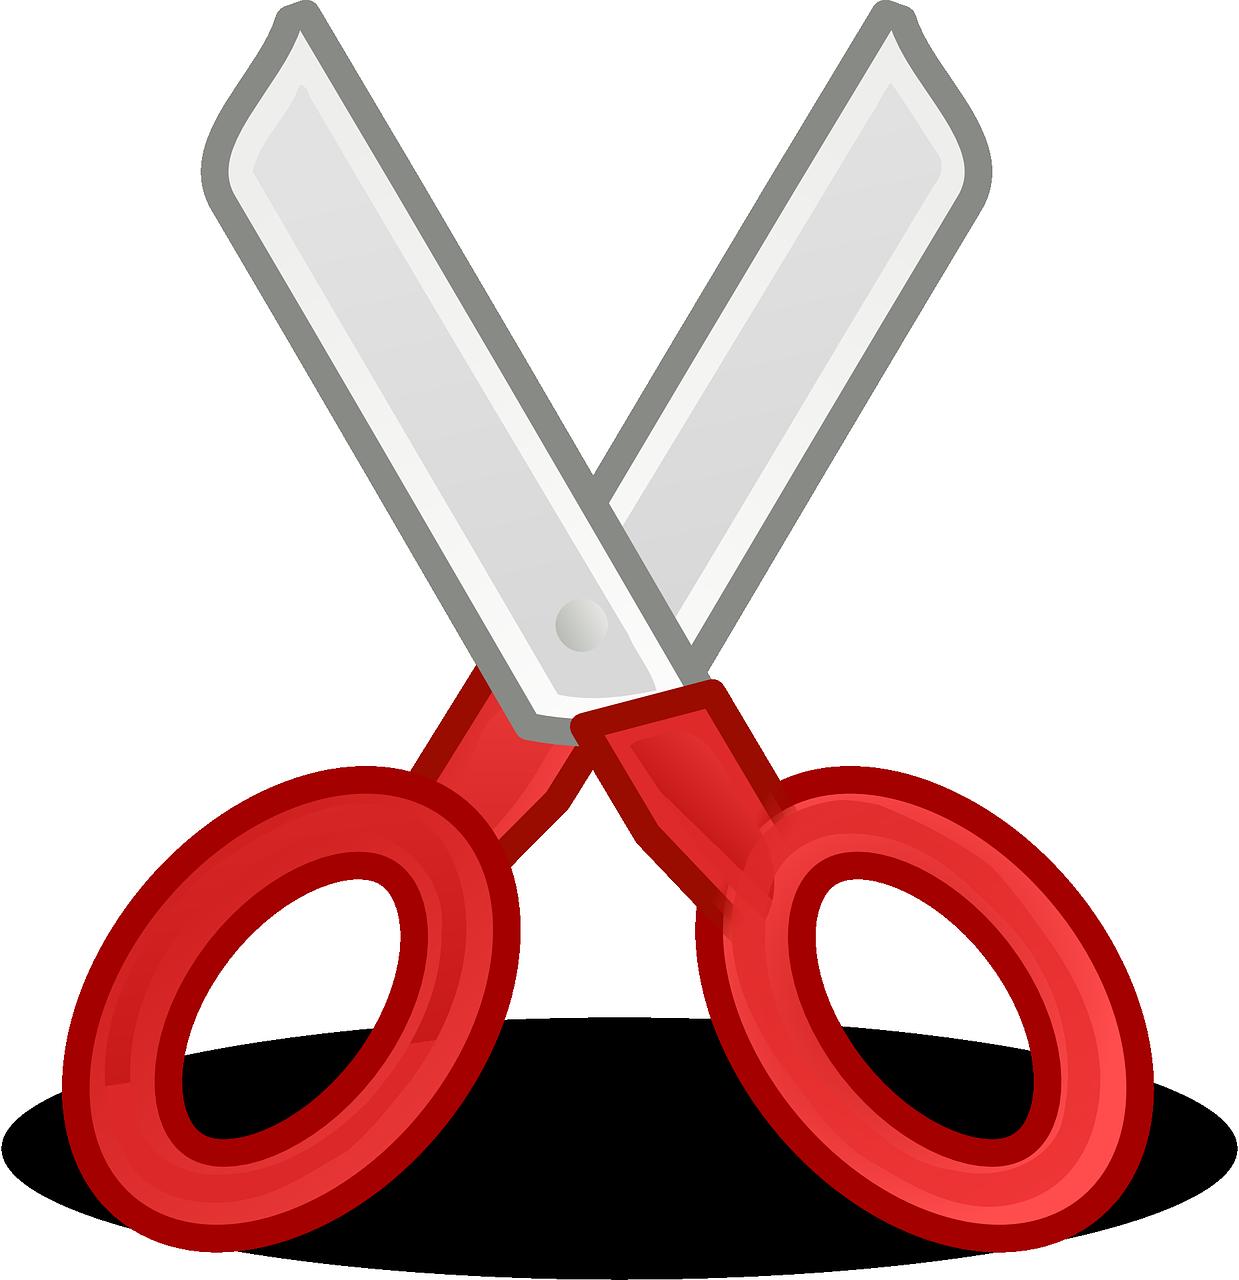 Scissors free to use clip art